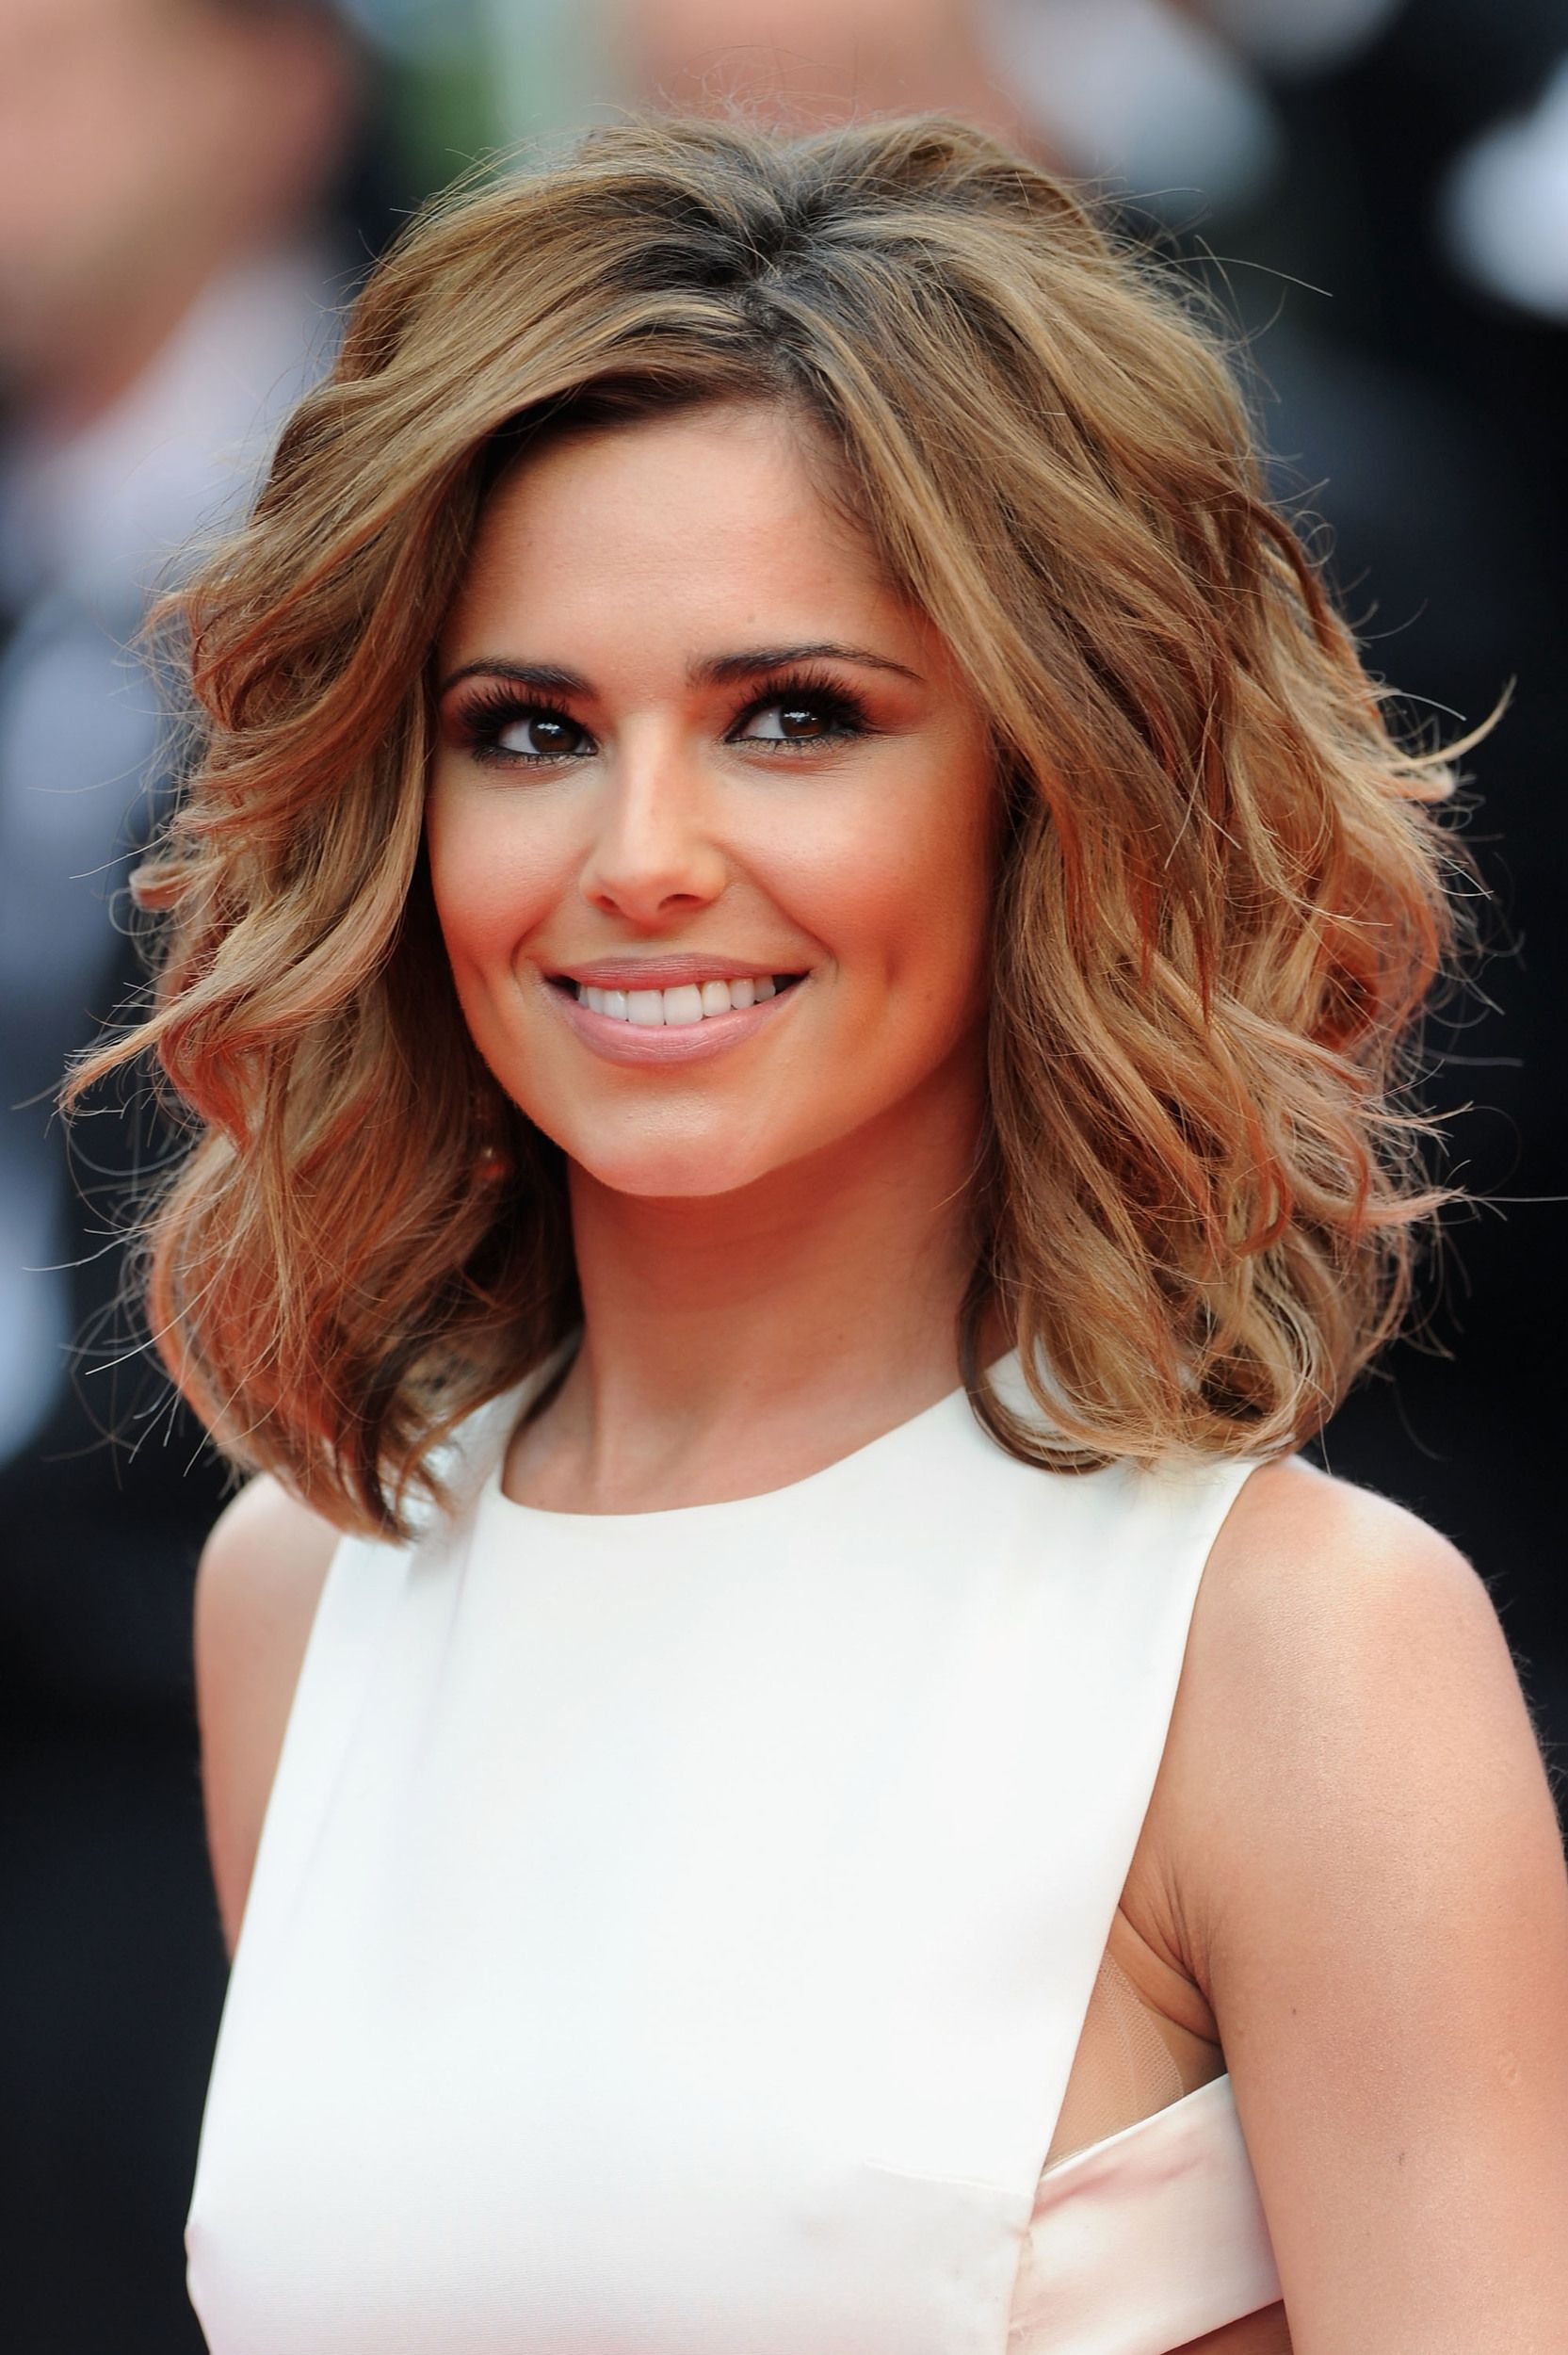 Hair Styles Curls For Medium Length Hair Barrel Curls